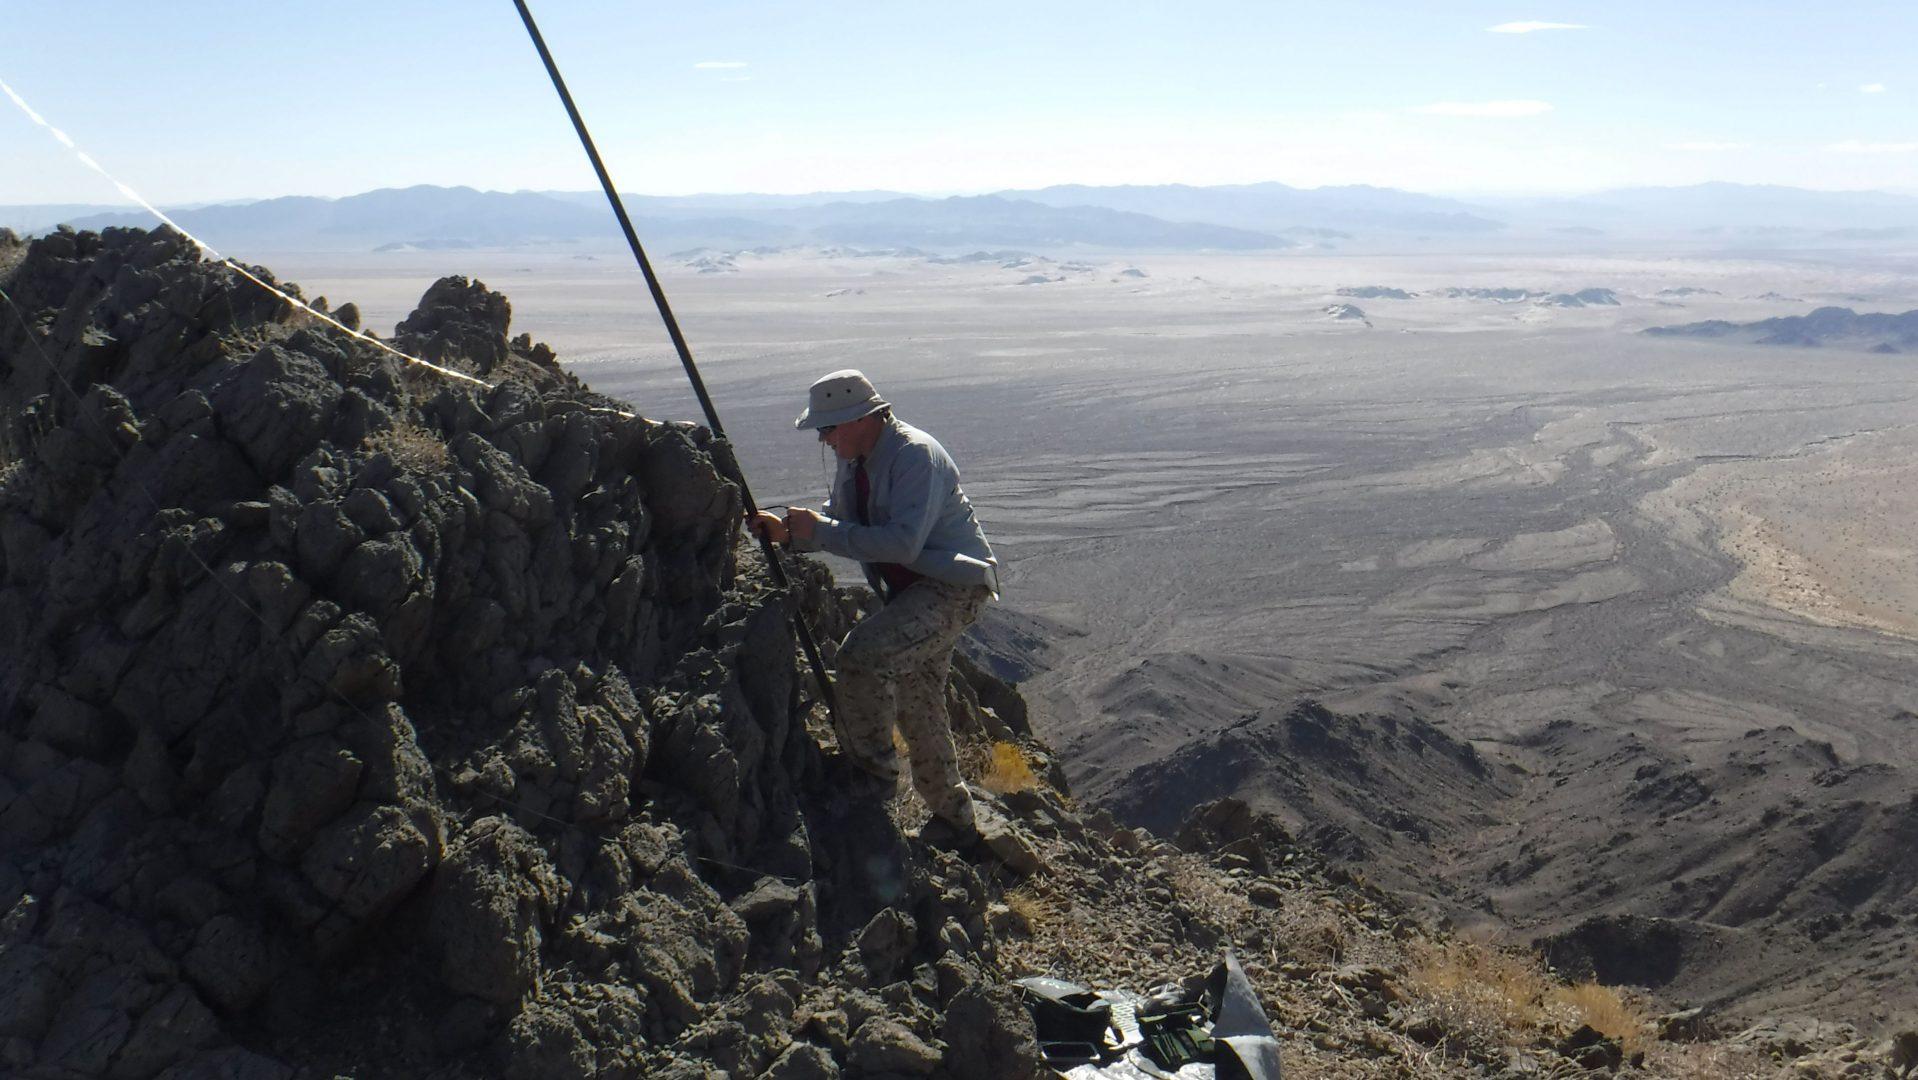 Ham radio operator setting up portable antenna for SOTA